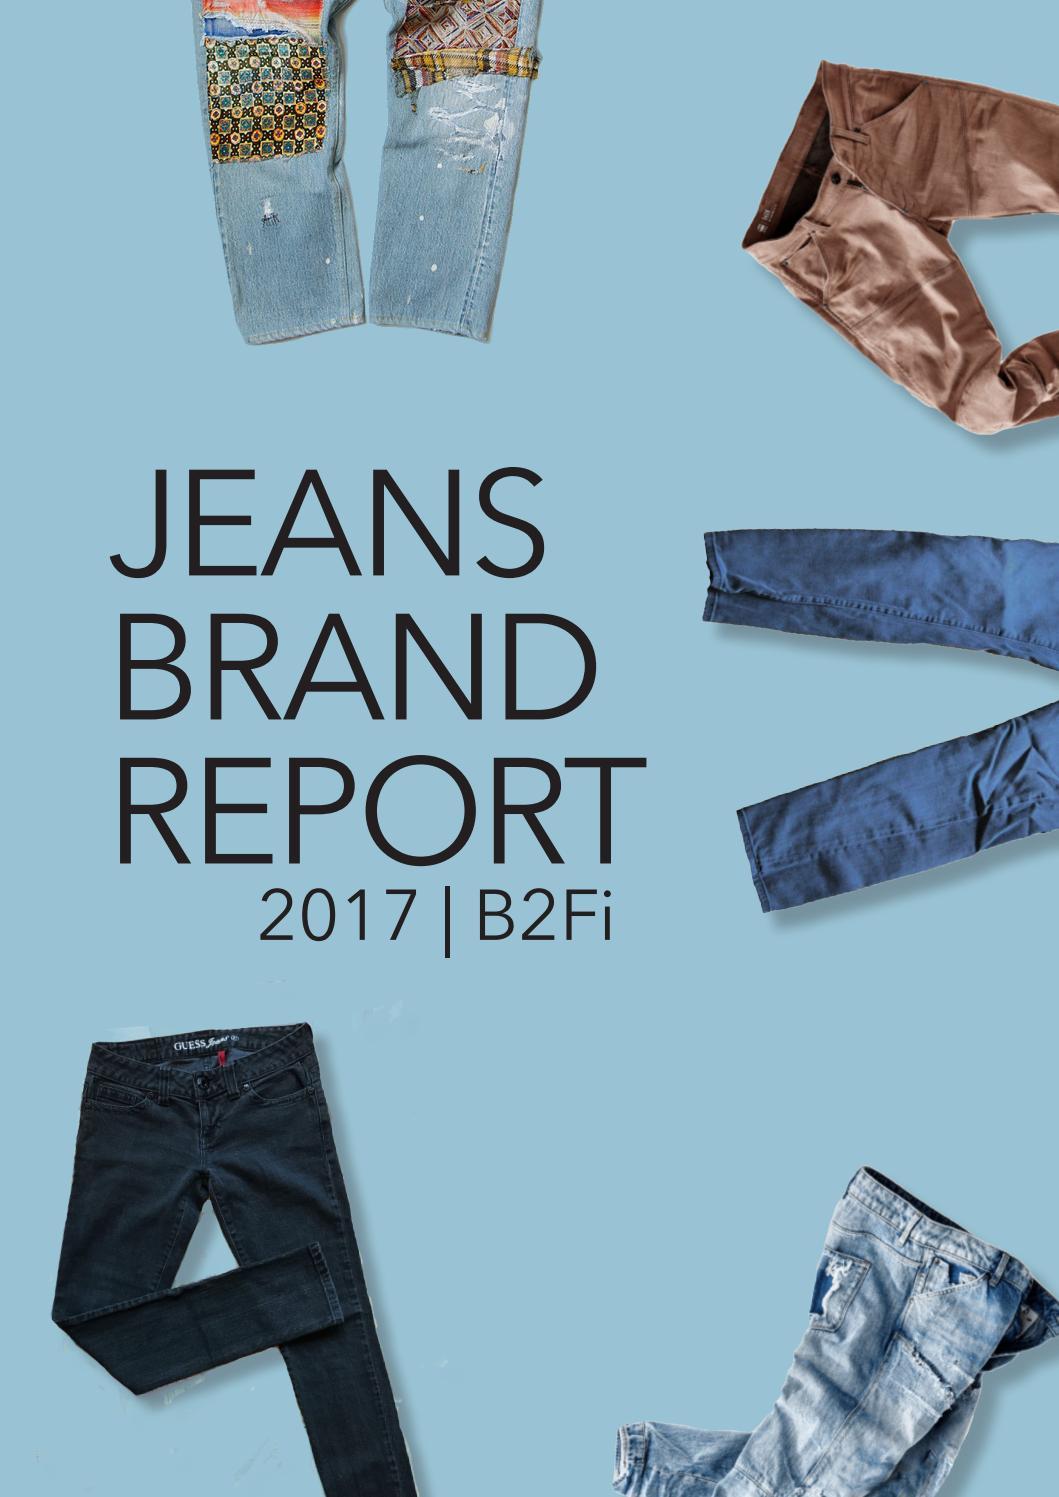 864714c88177 Jeans Brand Report by CLASS B2Fi - issuu